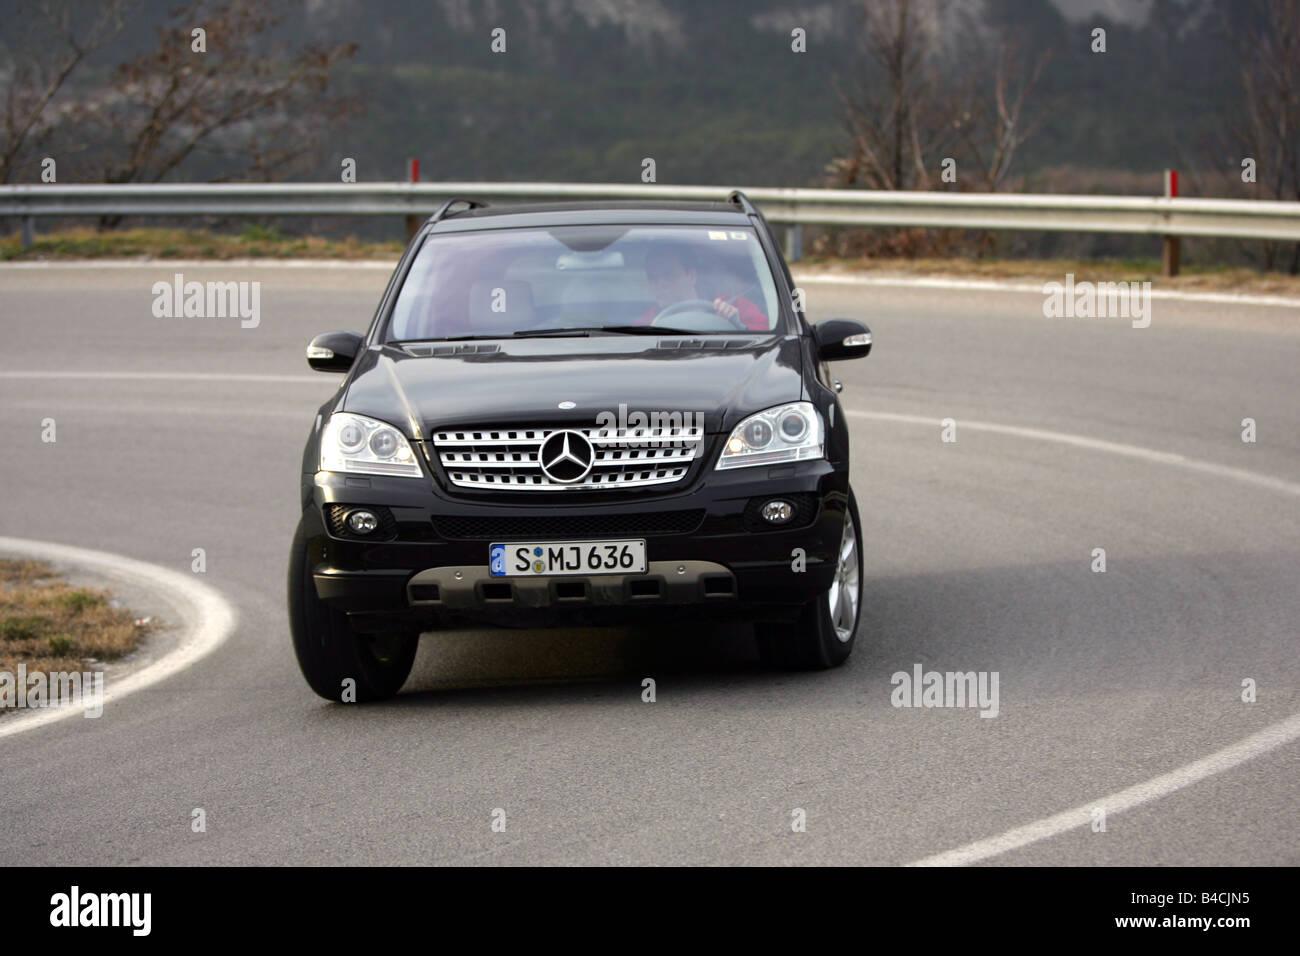 Mercedes Ml 320 Cdi Model Year 2005 Black Driving Diagonal From